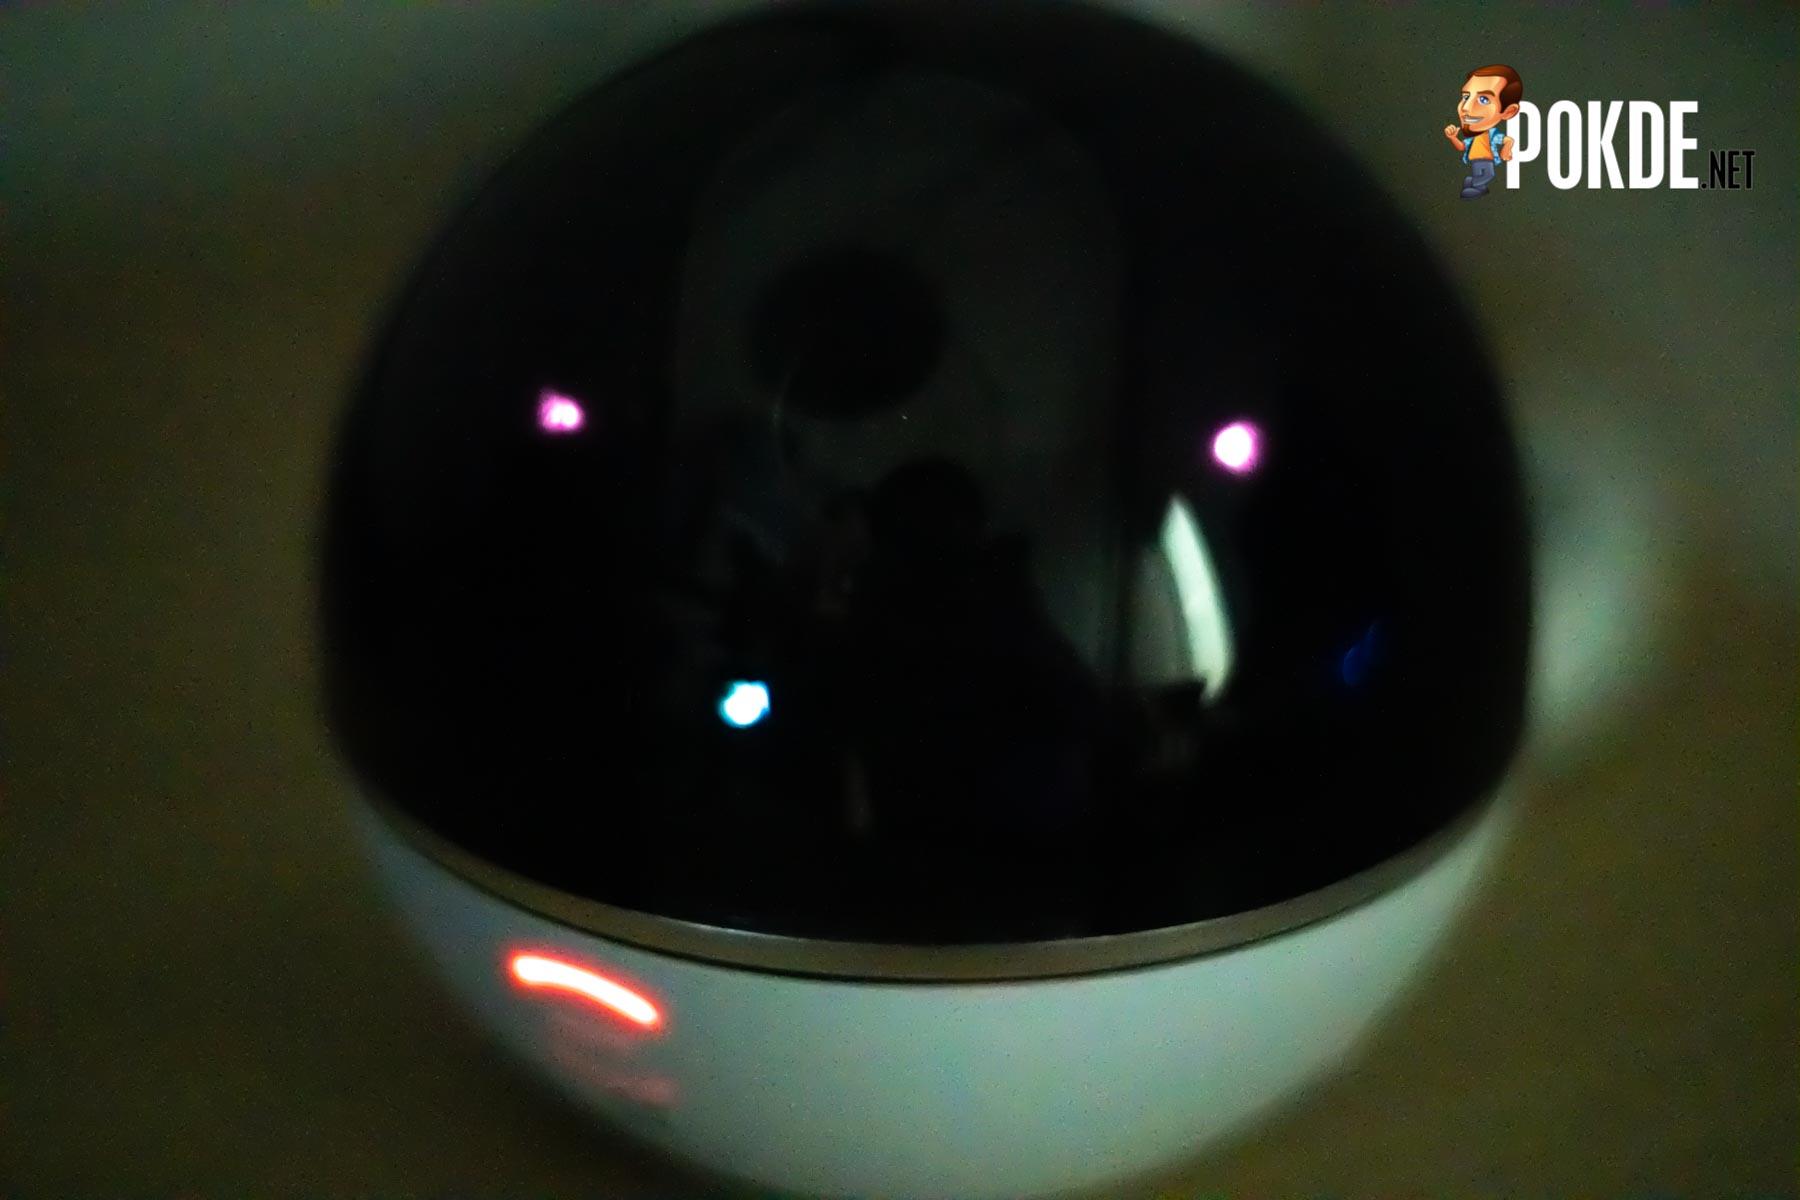 2 infrared LED, Ezviz C6T night vision, record in dark environment.